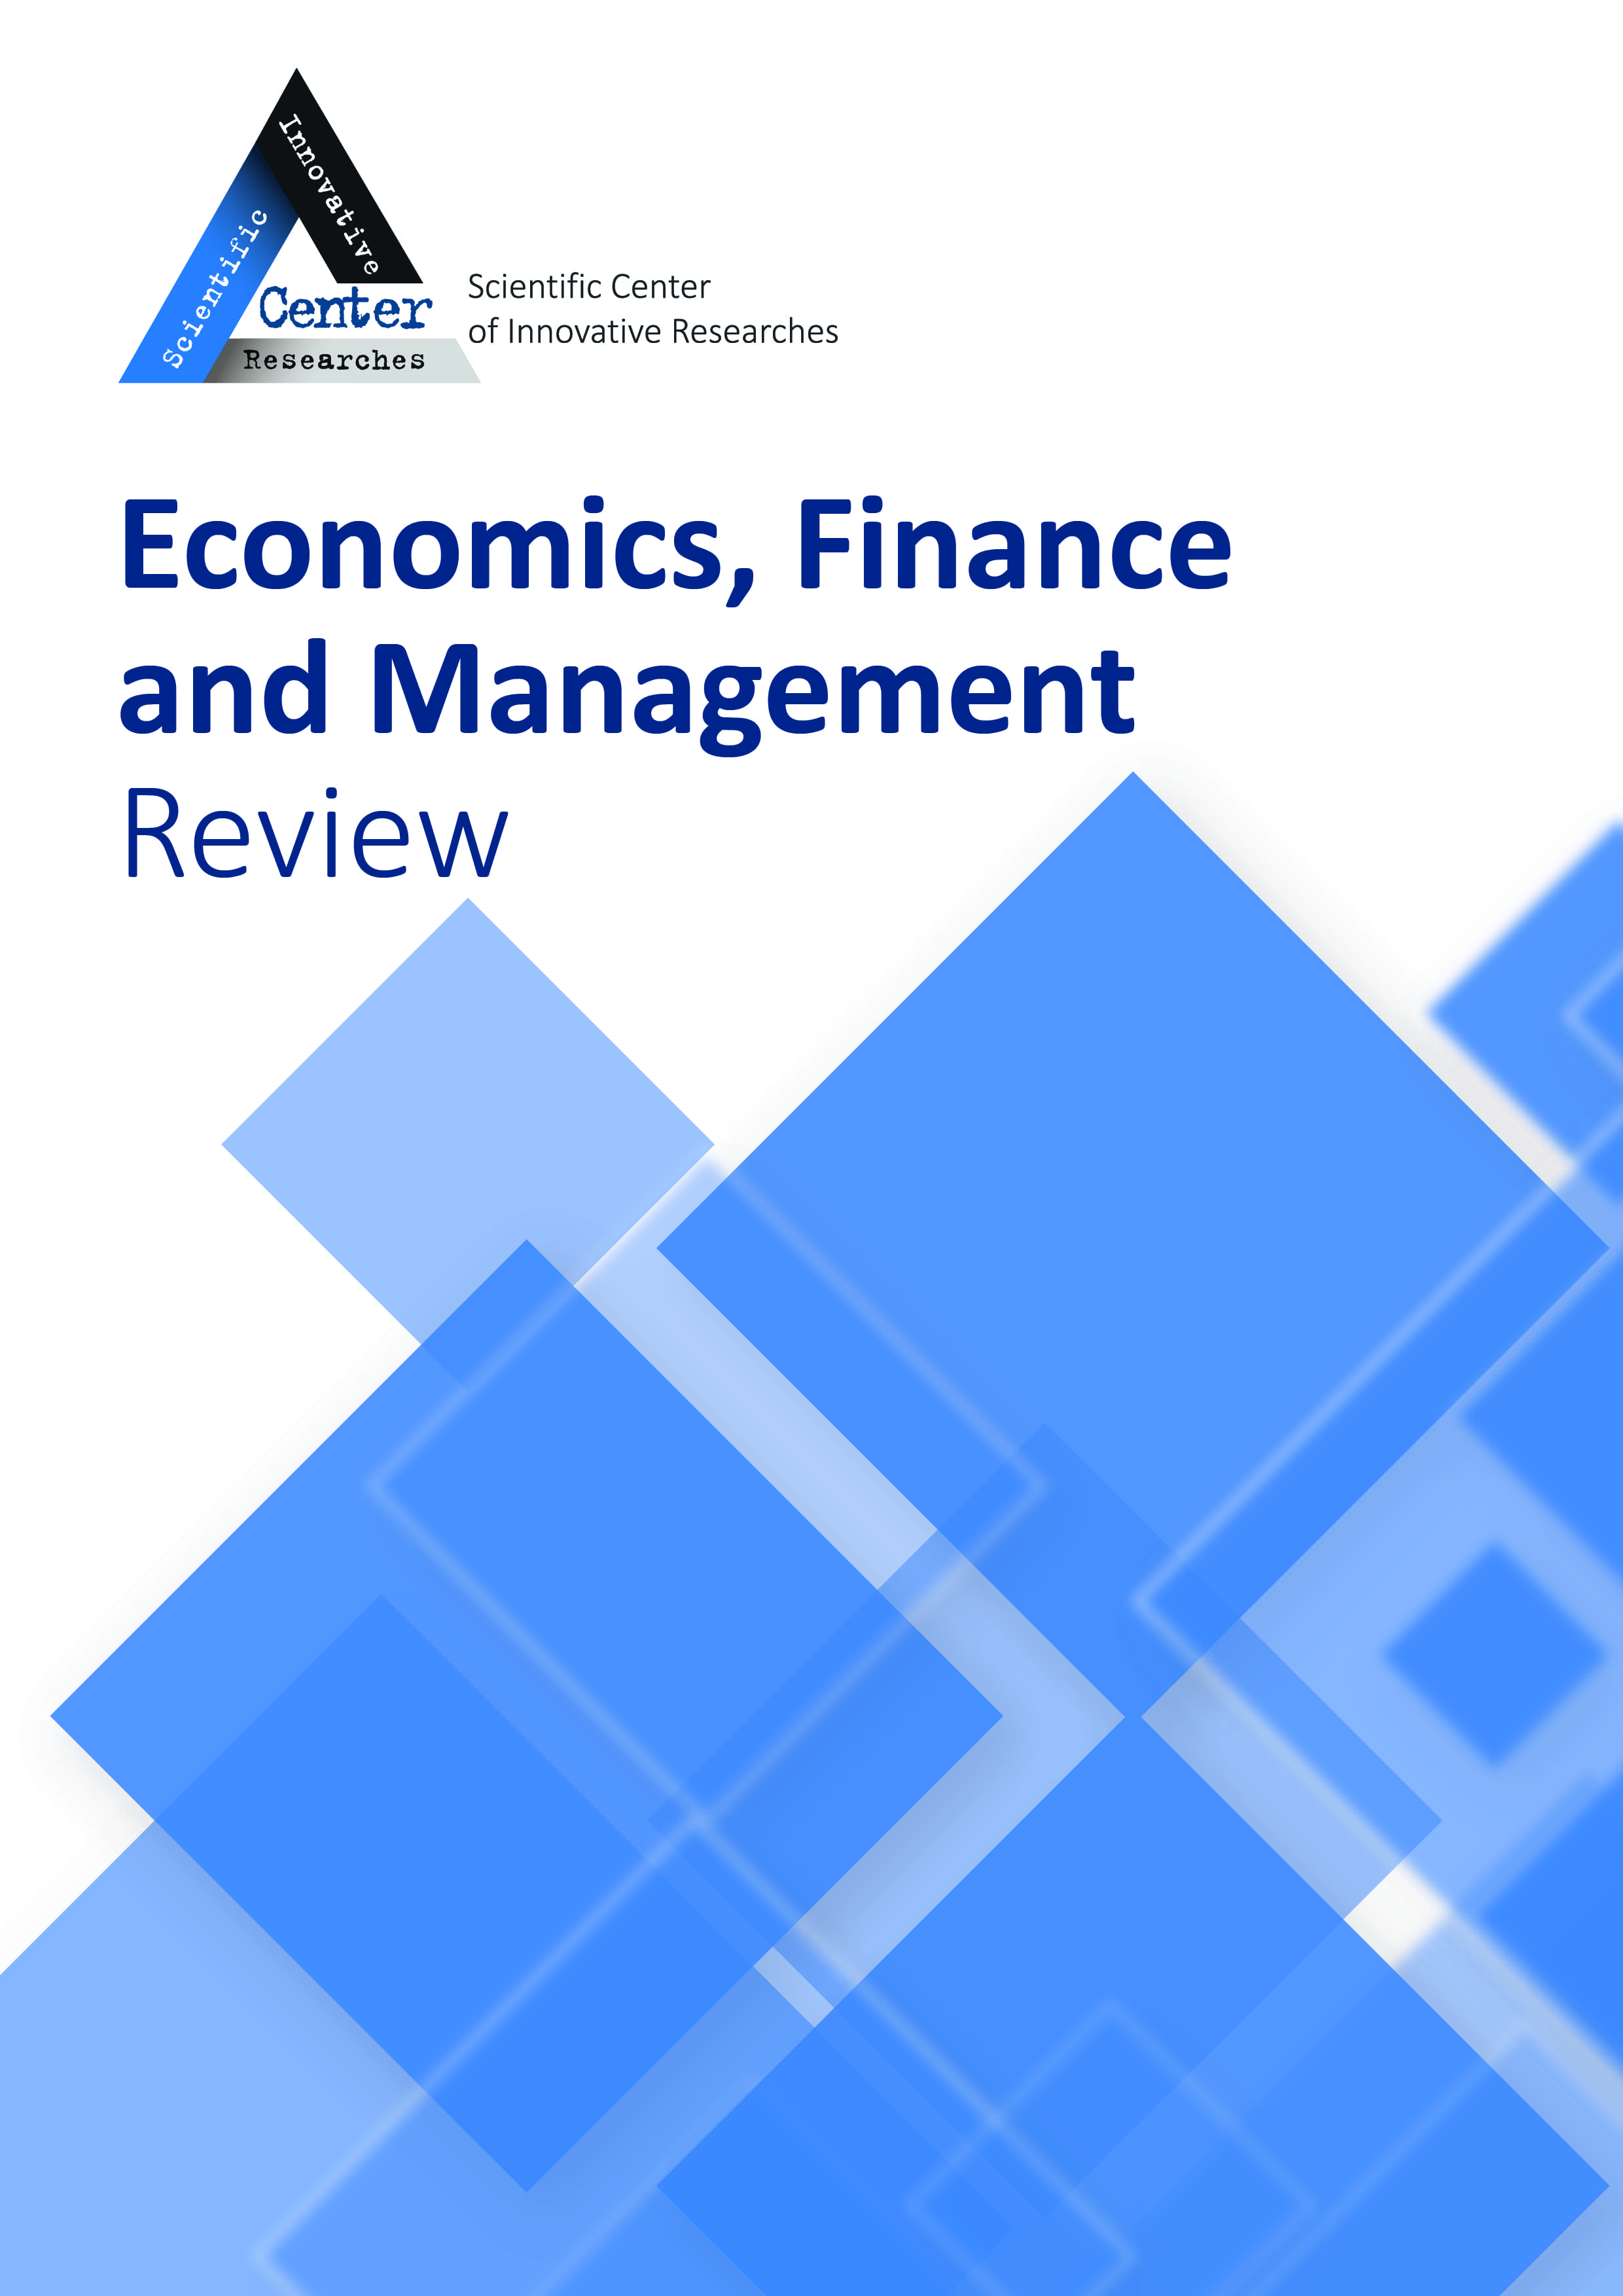 View No. 2 (2021): Economics, Finance And Management Review